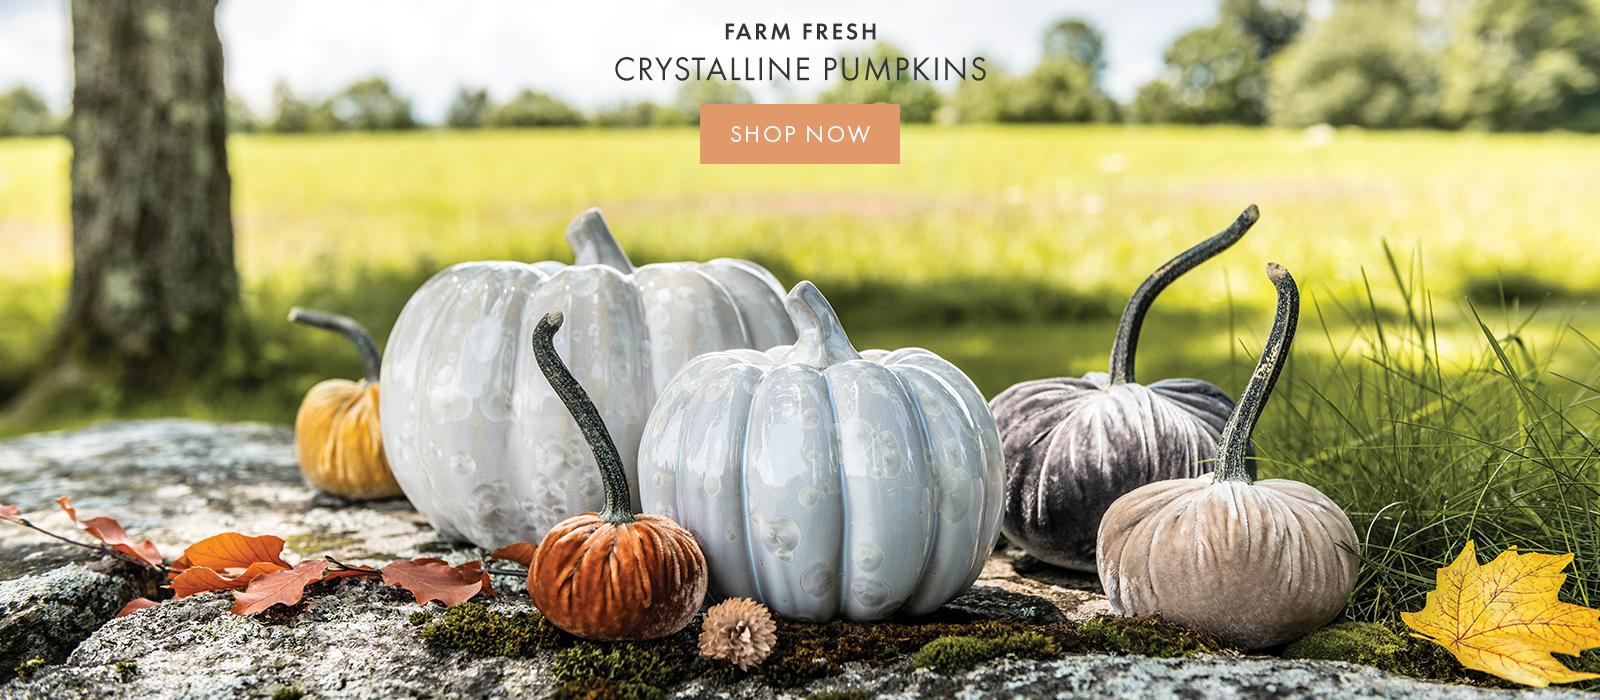 FARM FRESH CRYSTALLINE PUMPKINS — SHOP NOW >